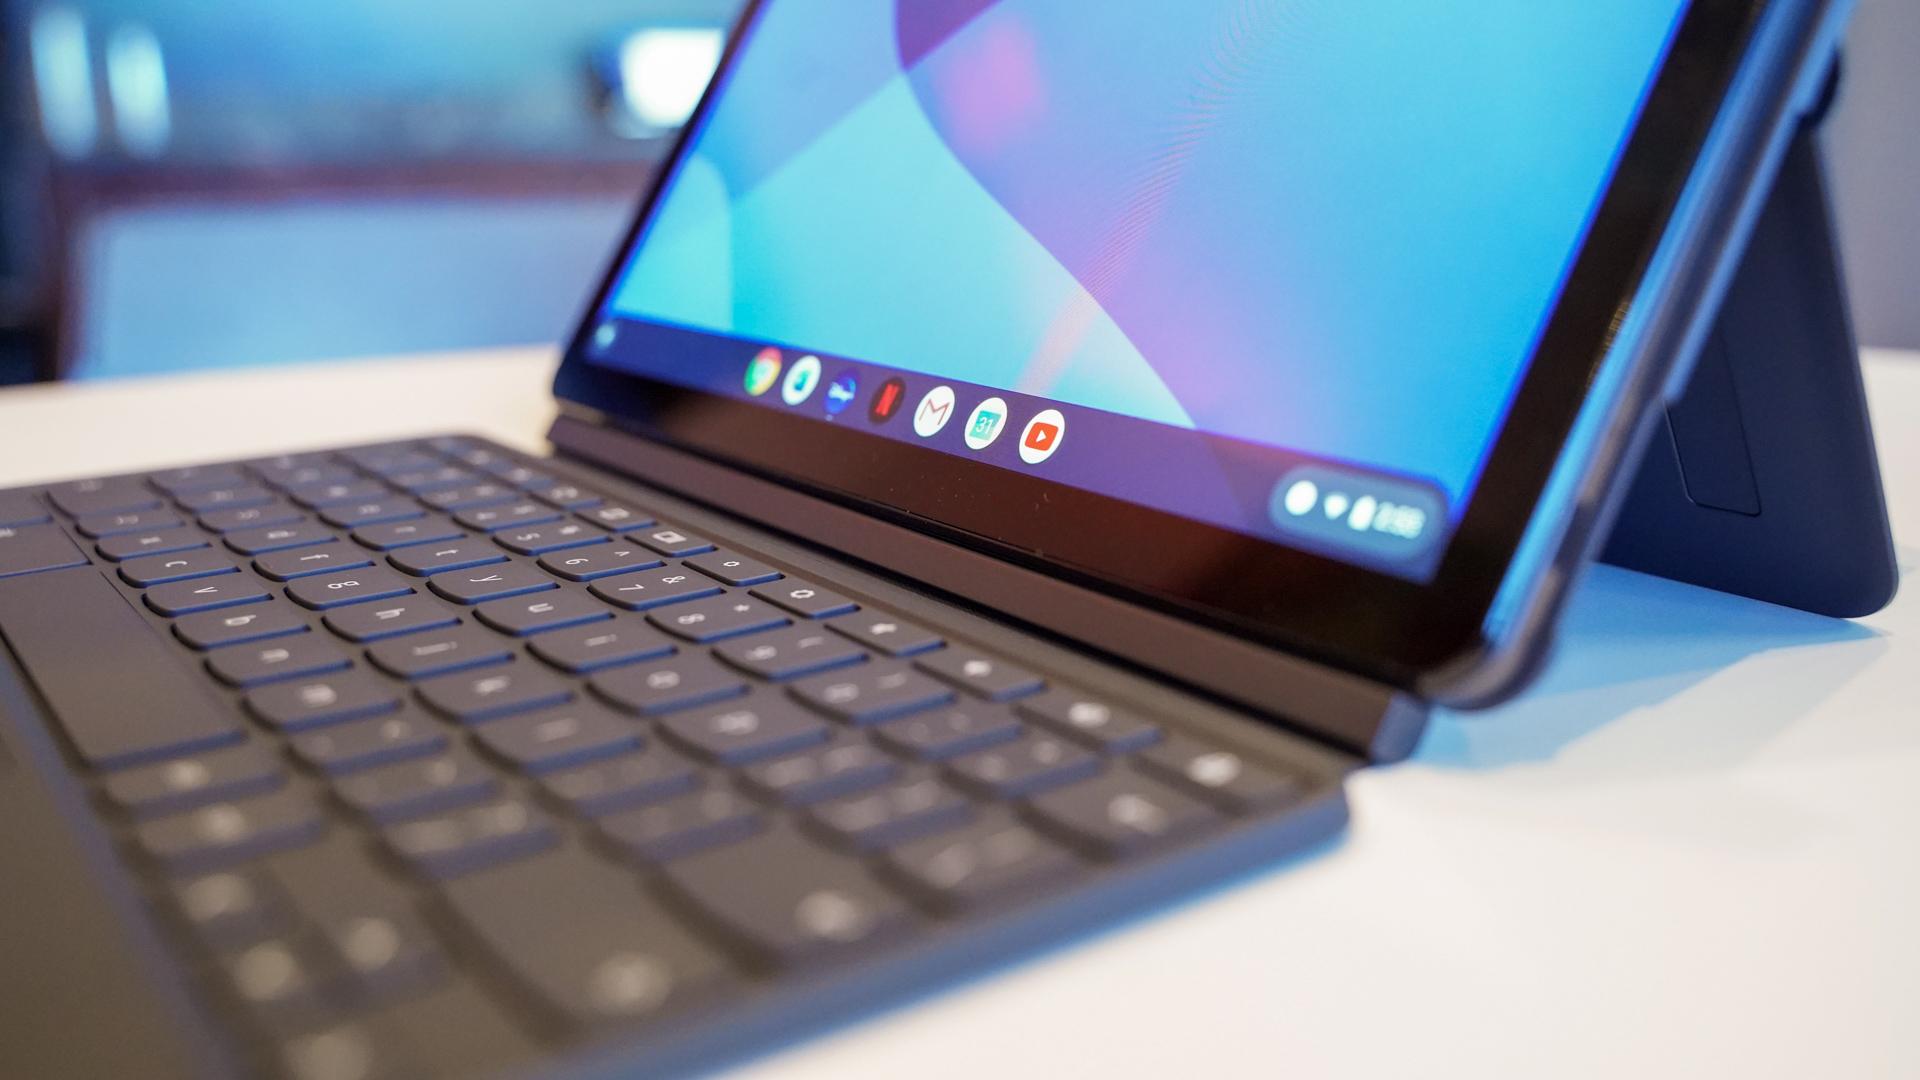 Lenovo IdeaPad Duet keyboard attachment